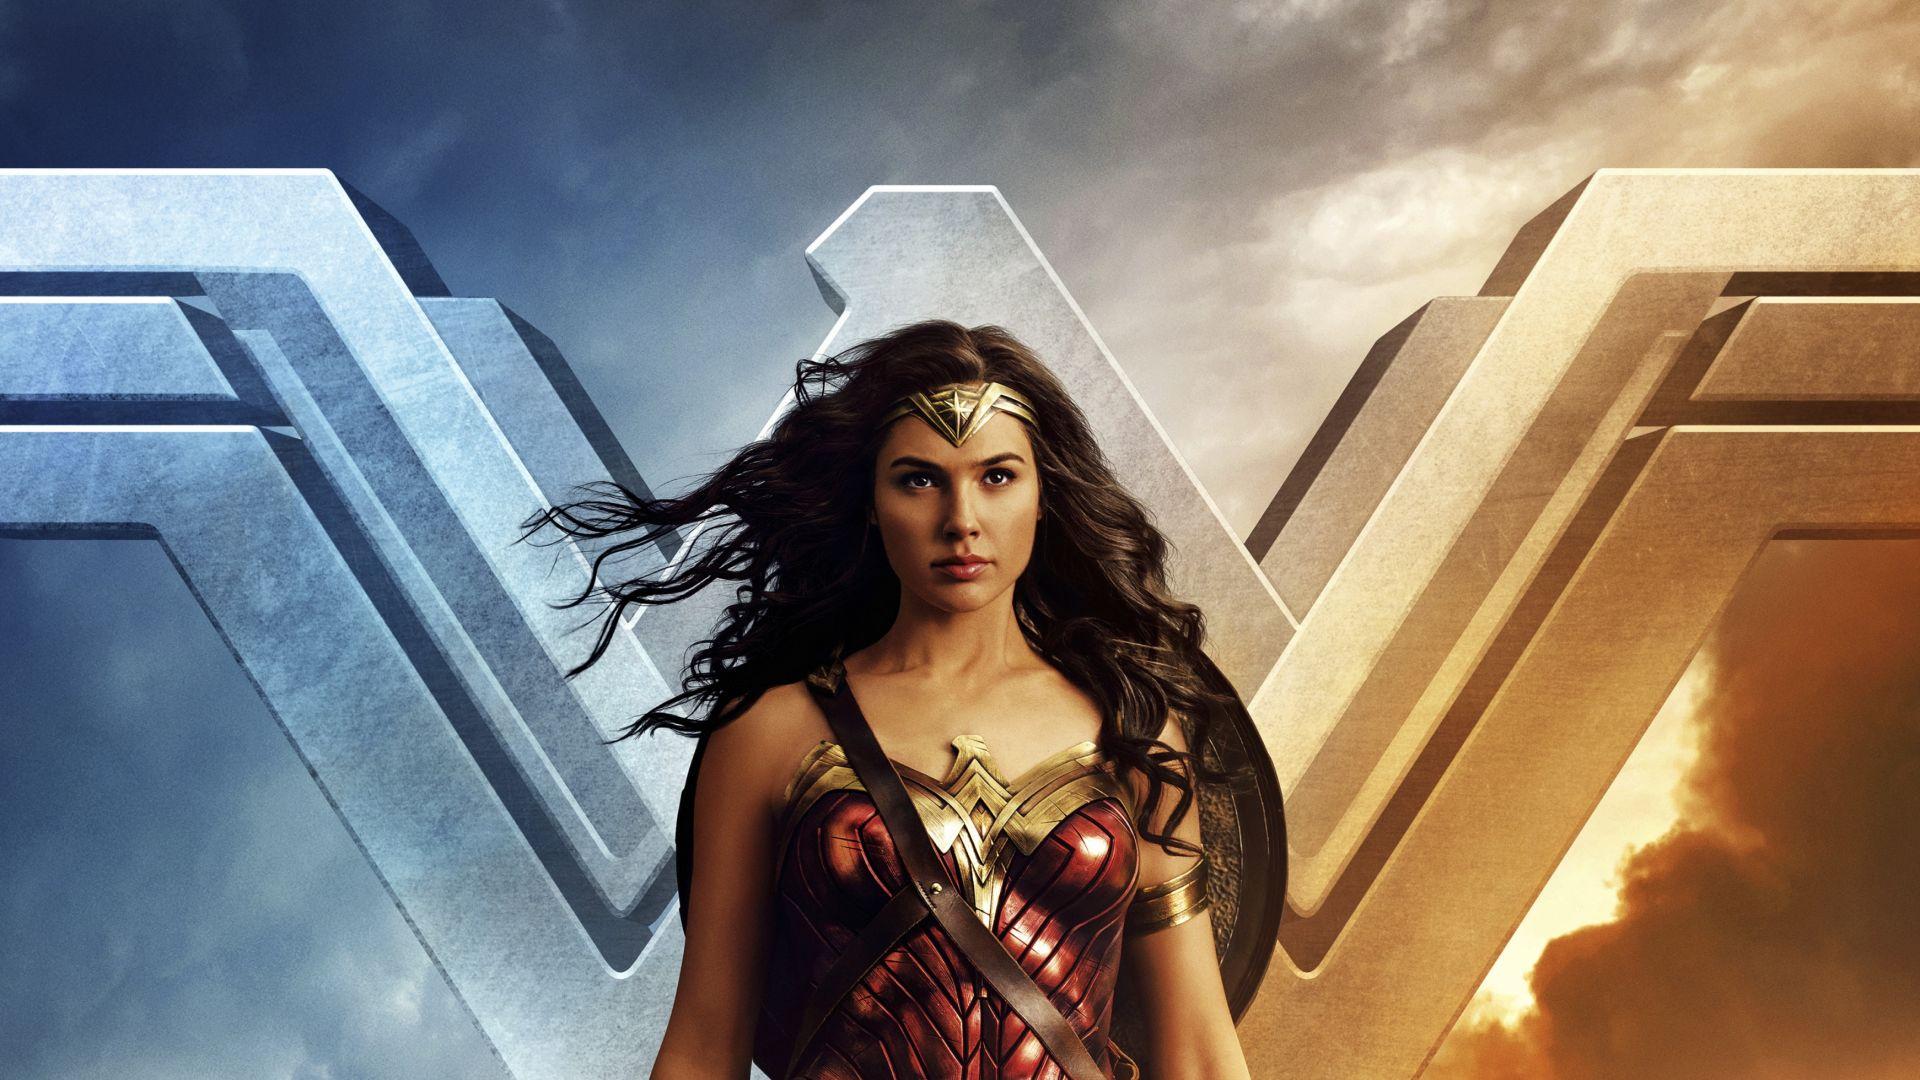 Wonder Woman Movie Wallpaper 1: Desktop Wallpaper Wonder Woman, Logo, Gal Gadot, Movie